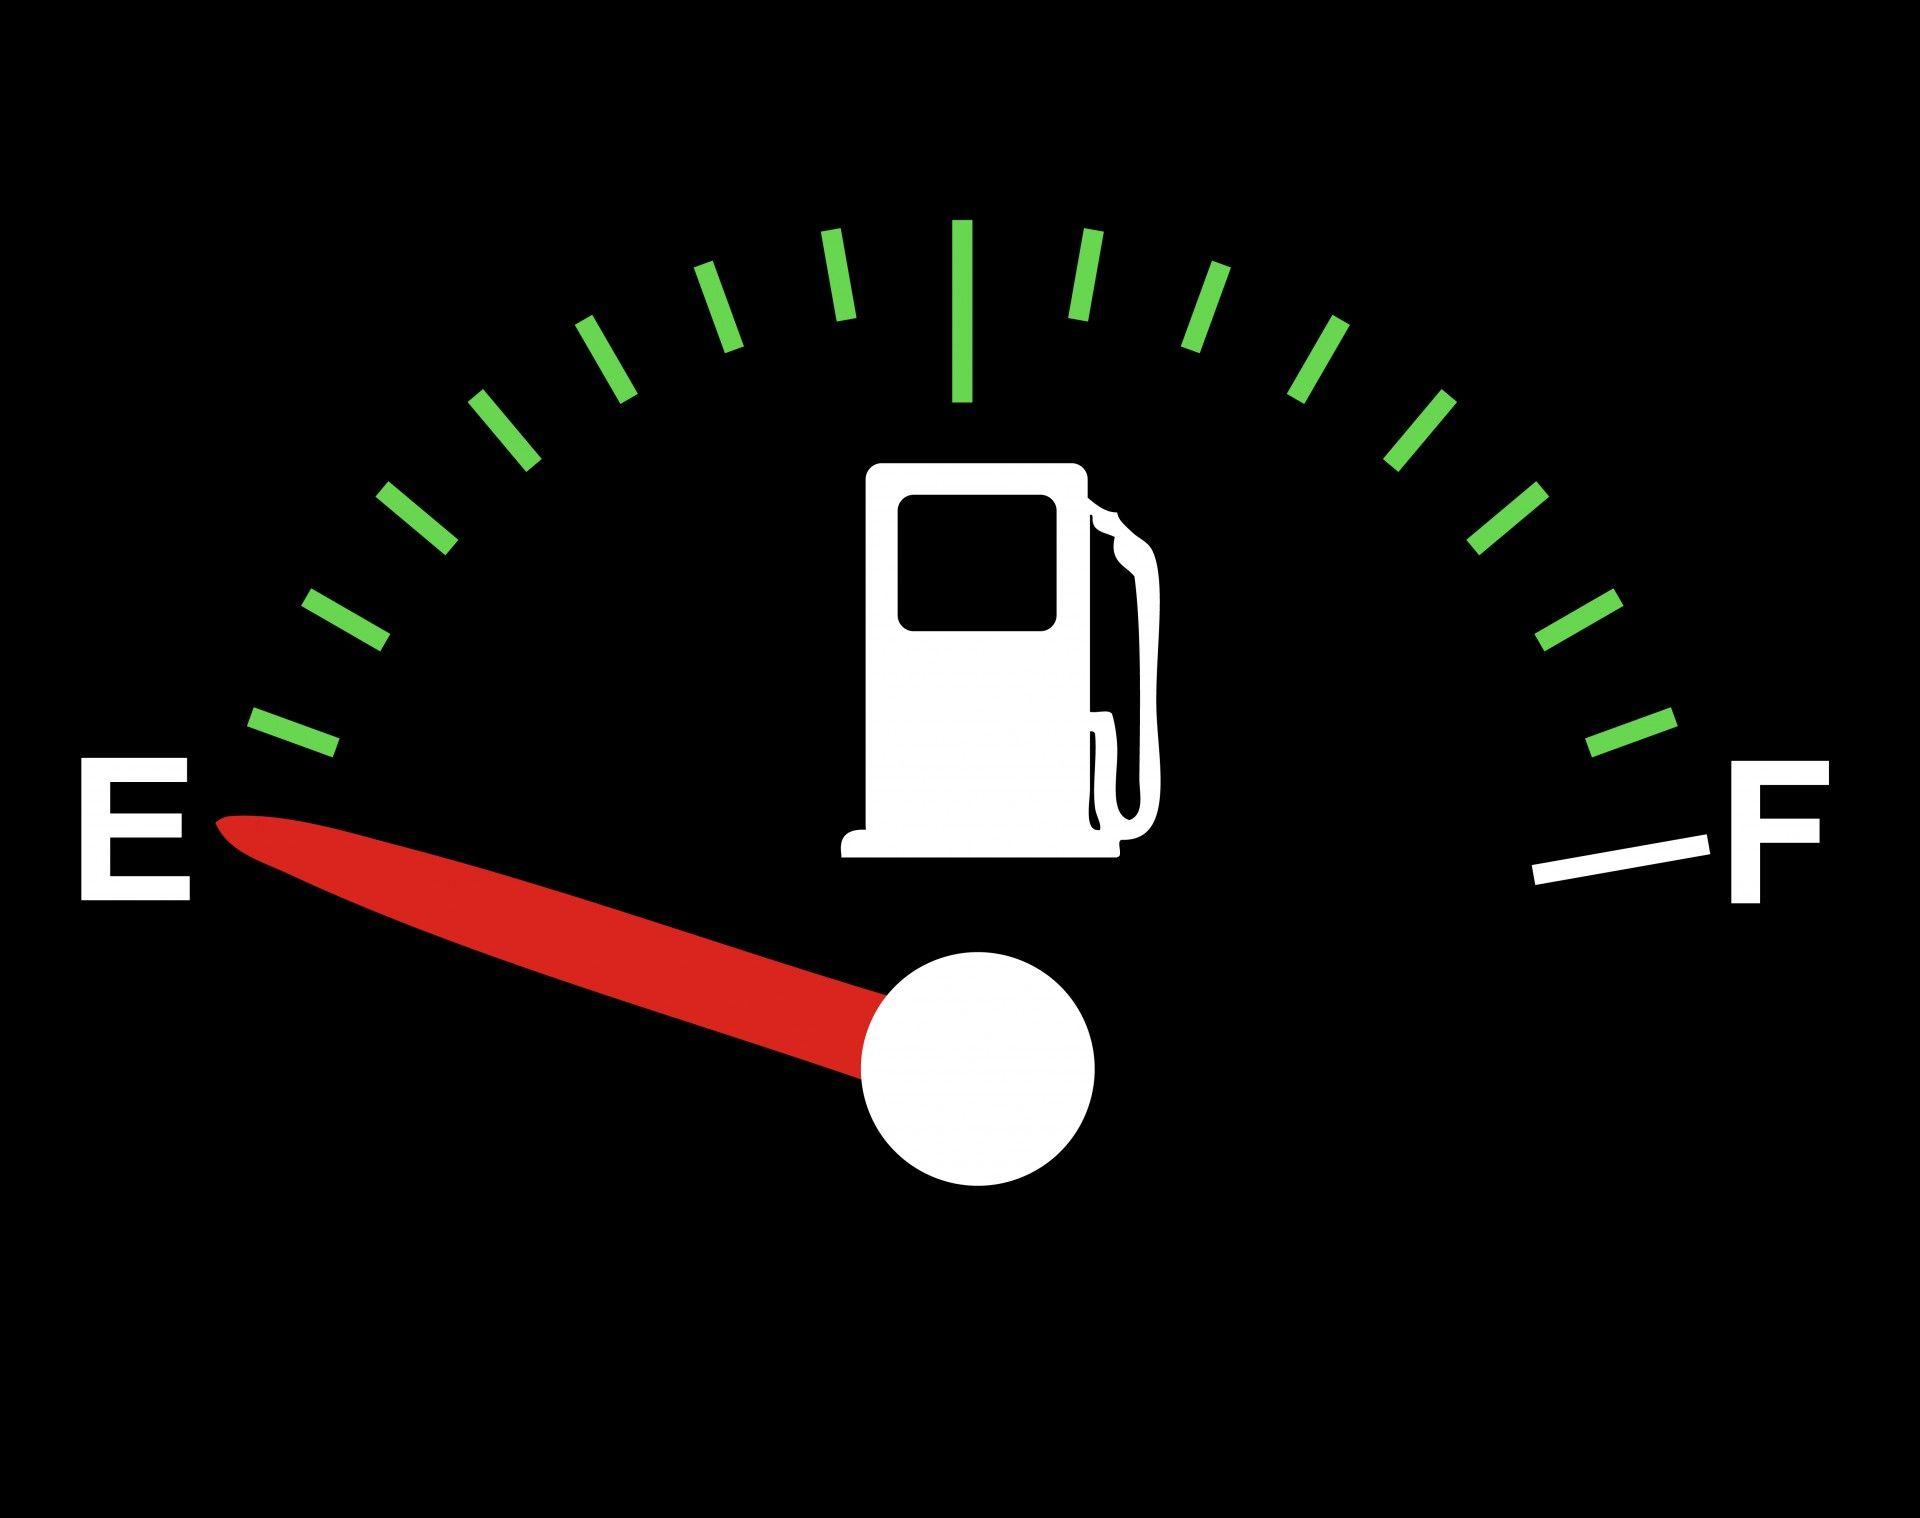 Fuelgauge save fuel preparedness fuel economy